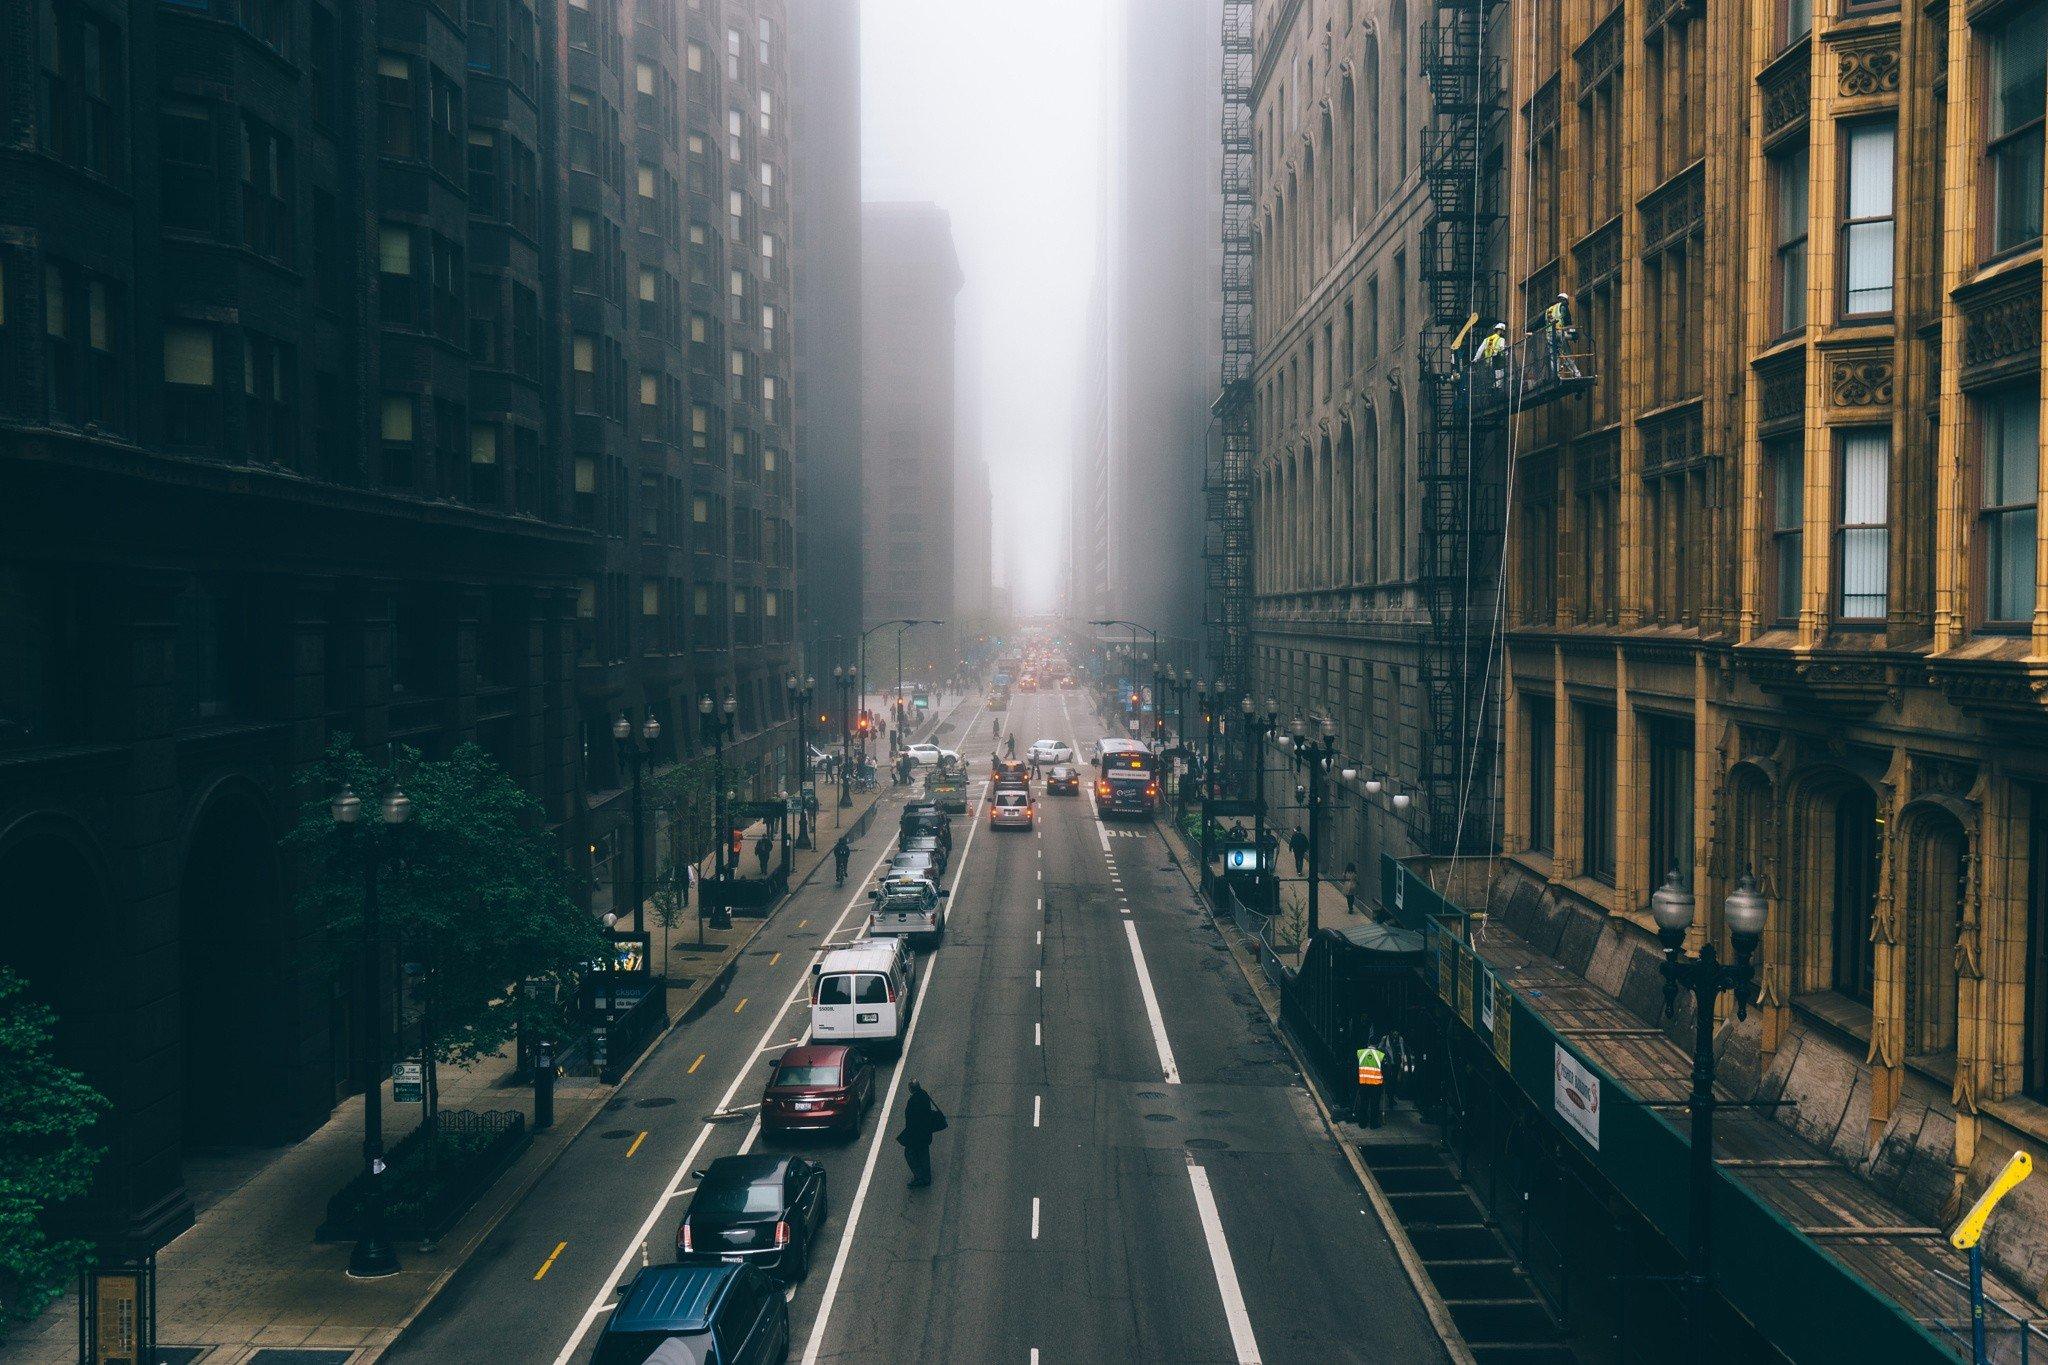 Картинка город не важен